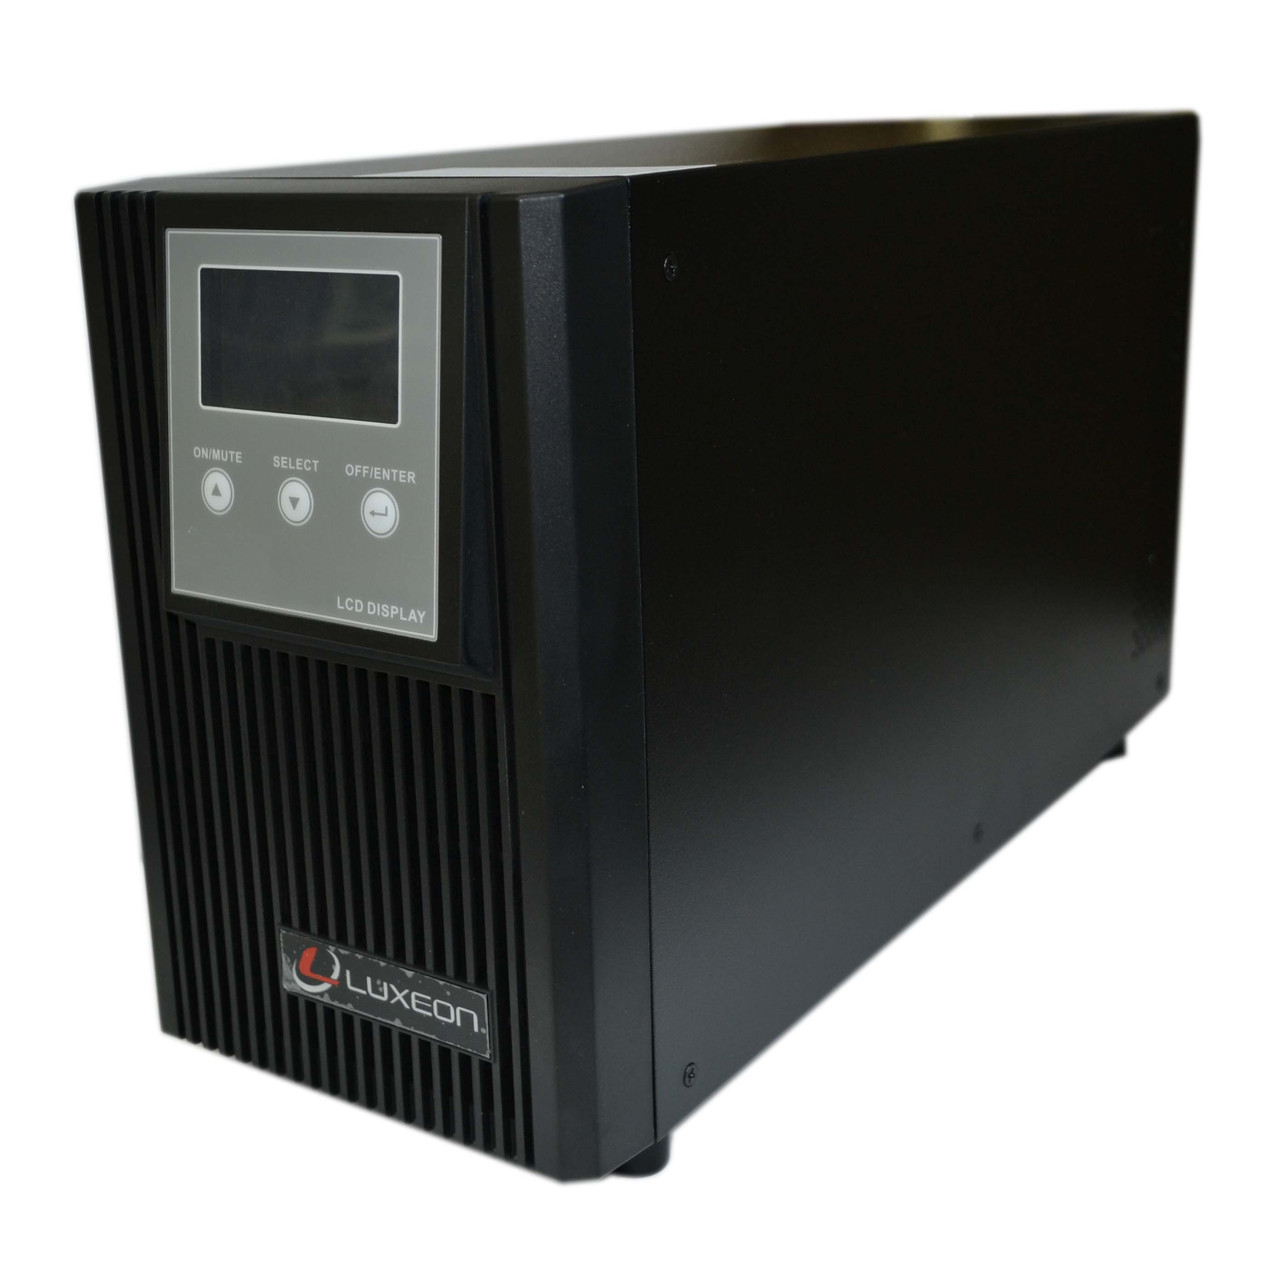 Luxeon UPS-3000LE